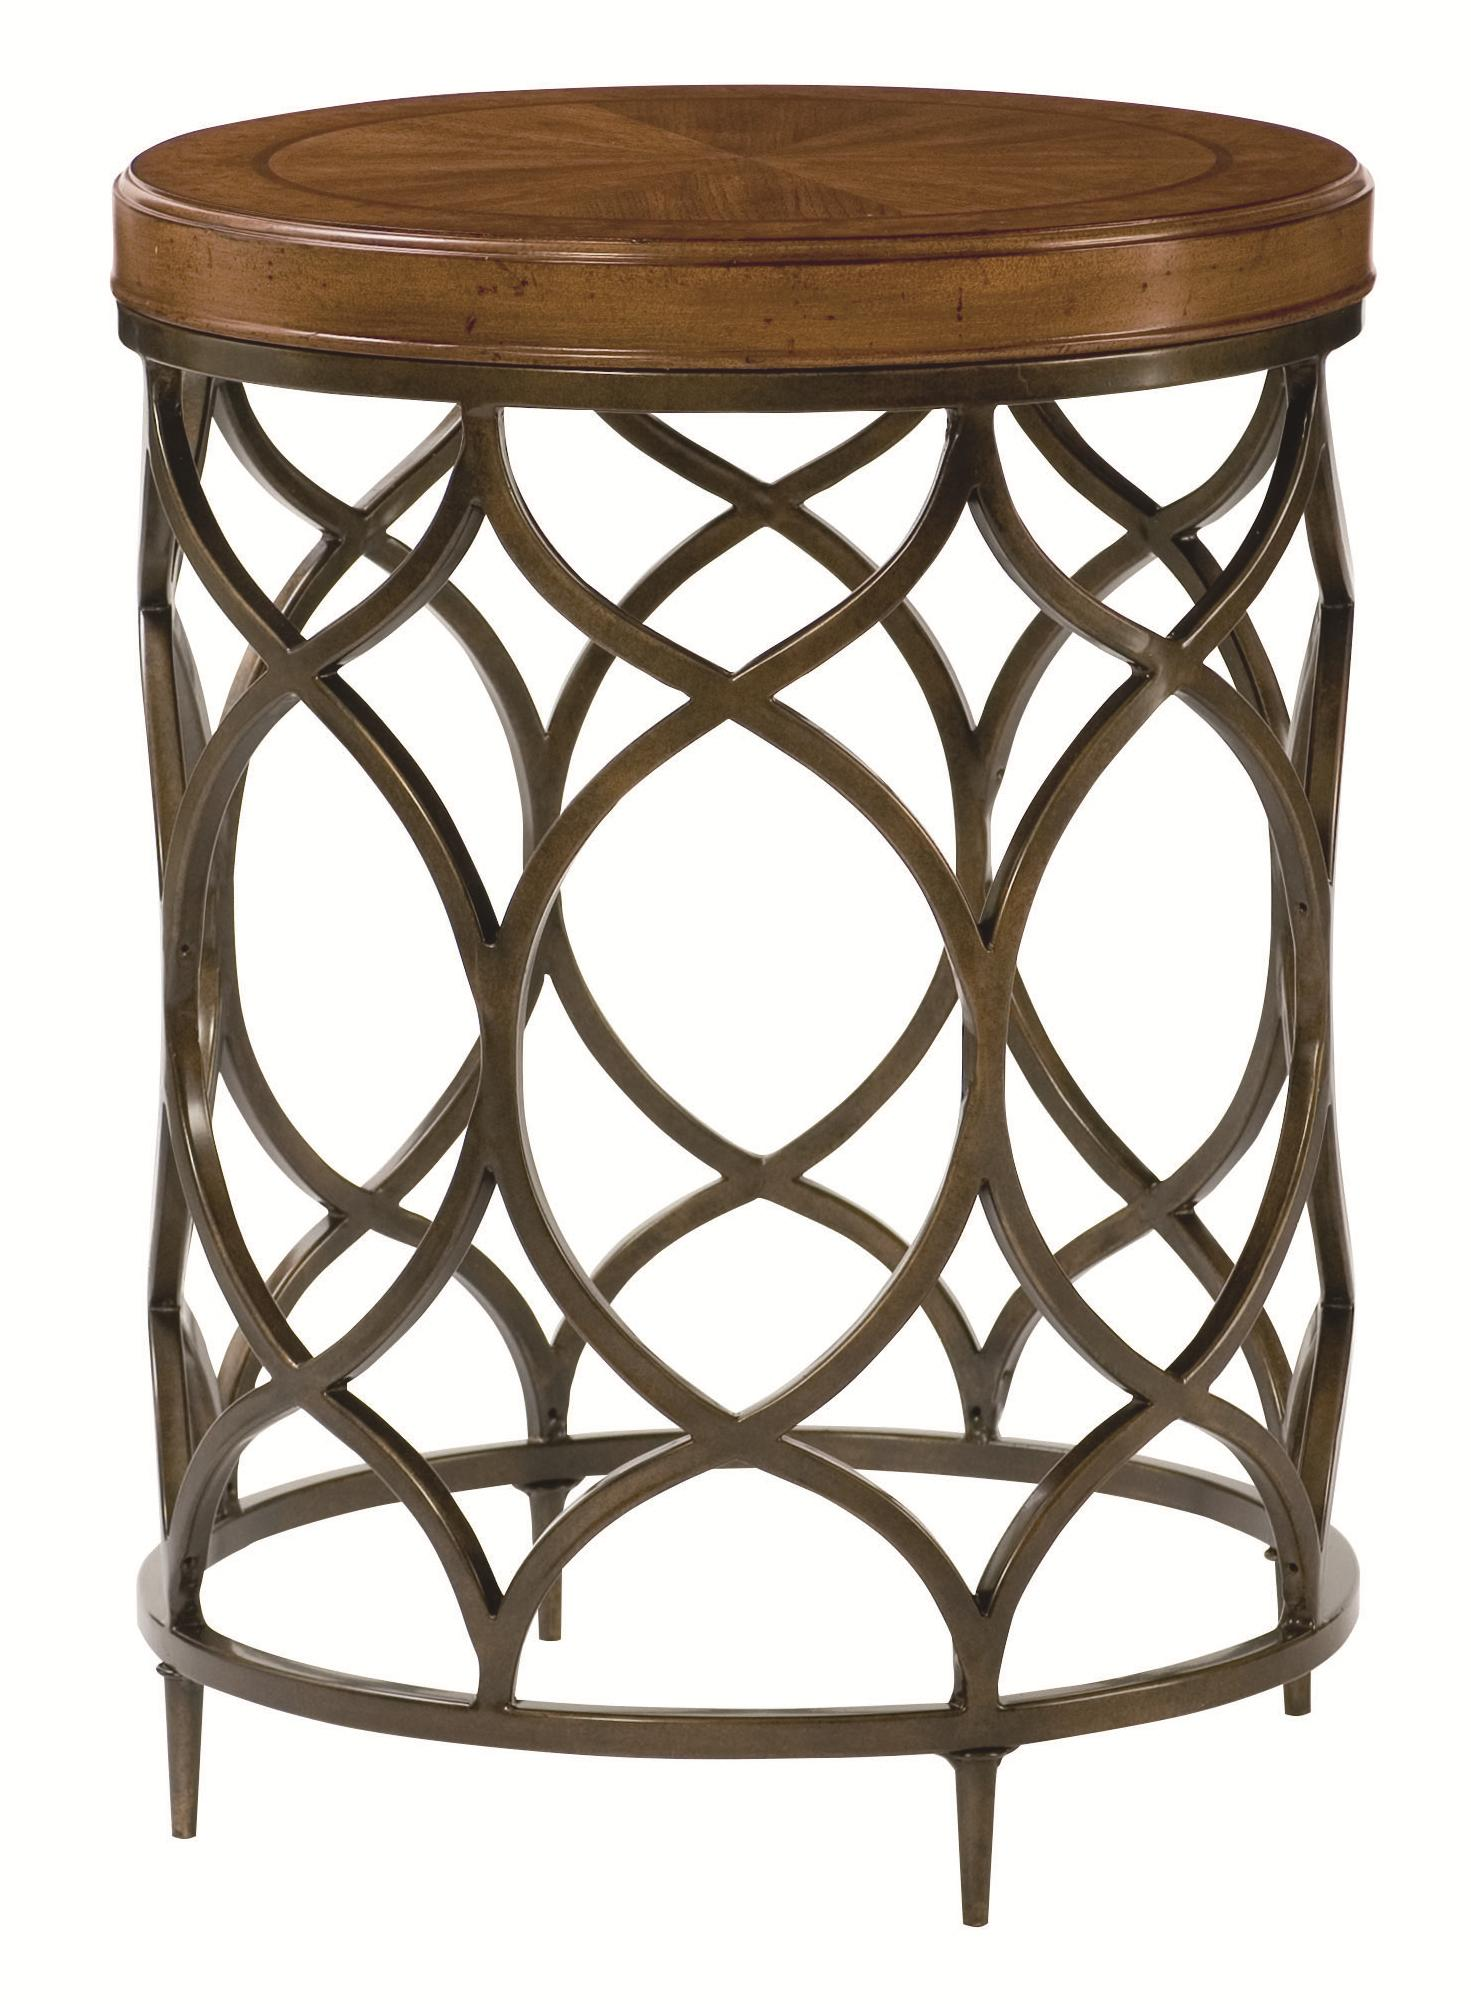 Hammary Hidden Treasures Round Lamp Table with Decorative